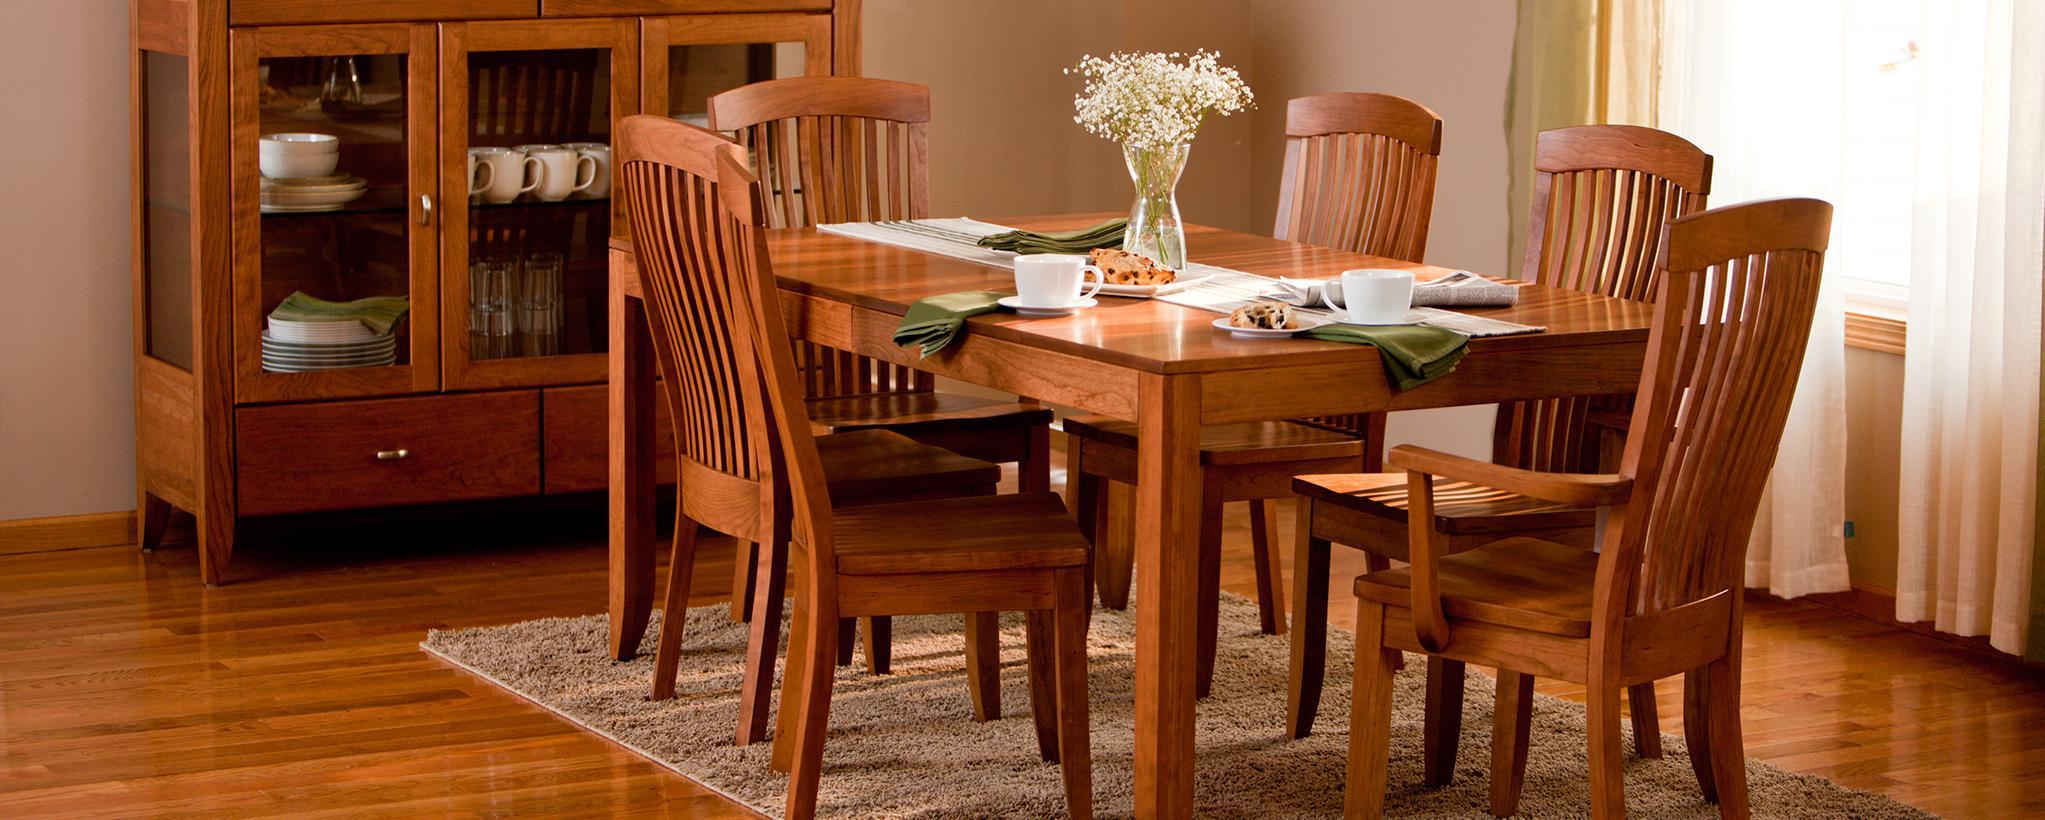 Cabinets outdoor furniture indoor furniture nashville tn for Outdoor furniture nashville